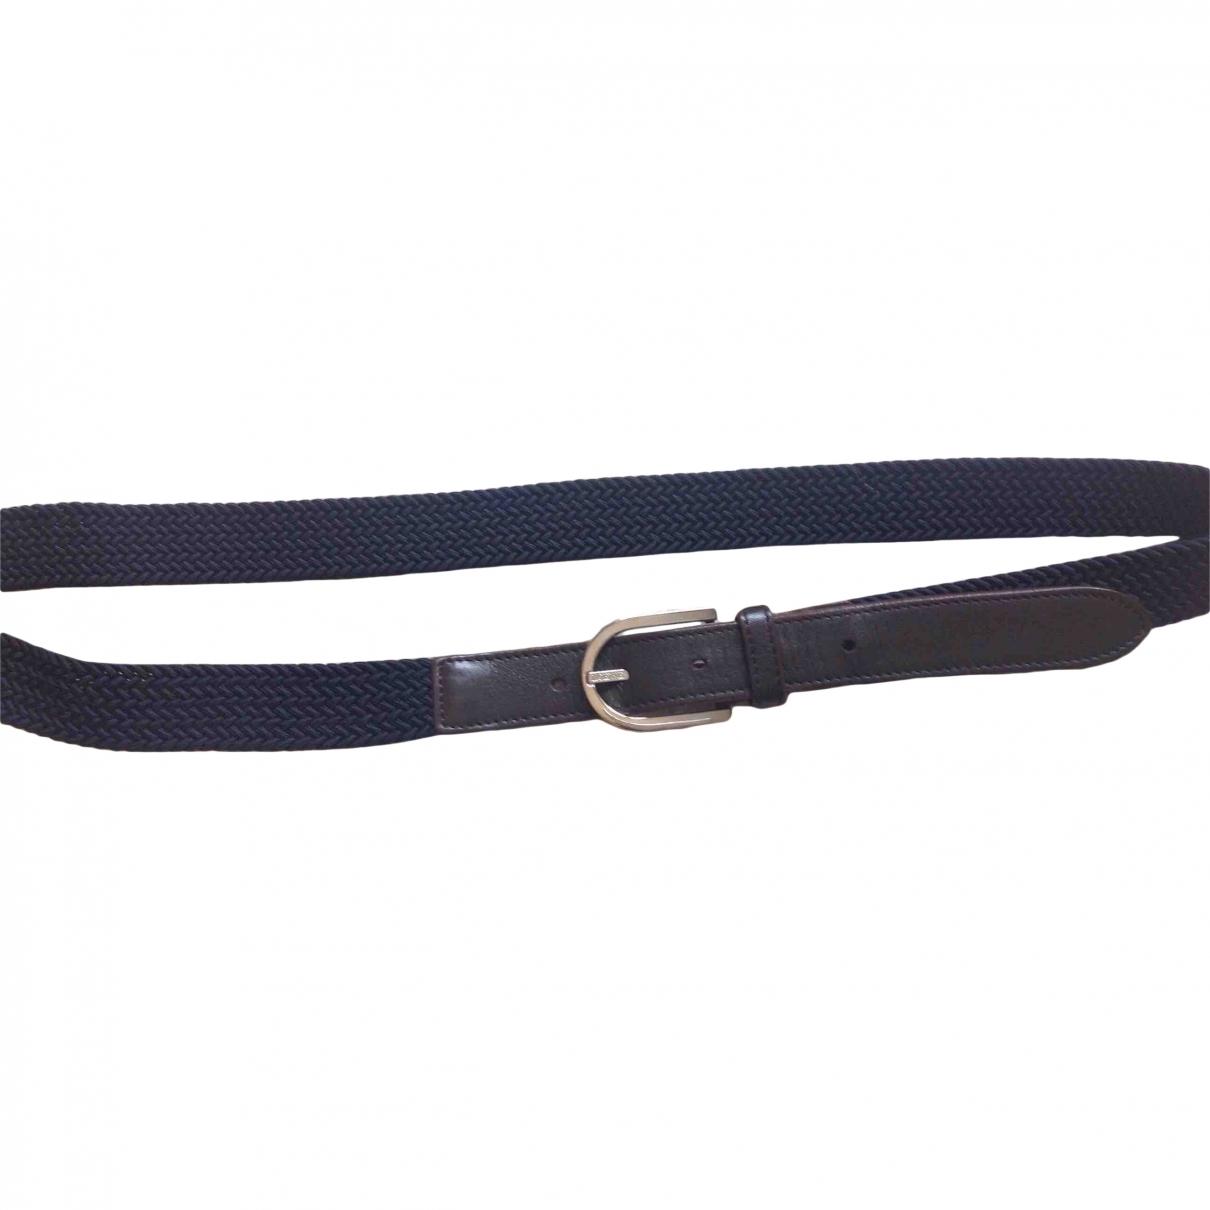 Loewe \N Navy Leather belt for Men L international